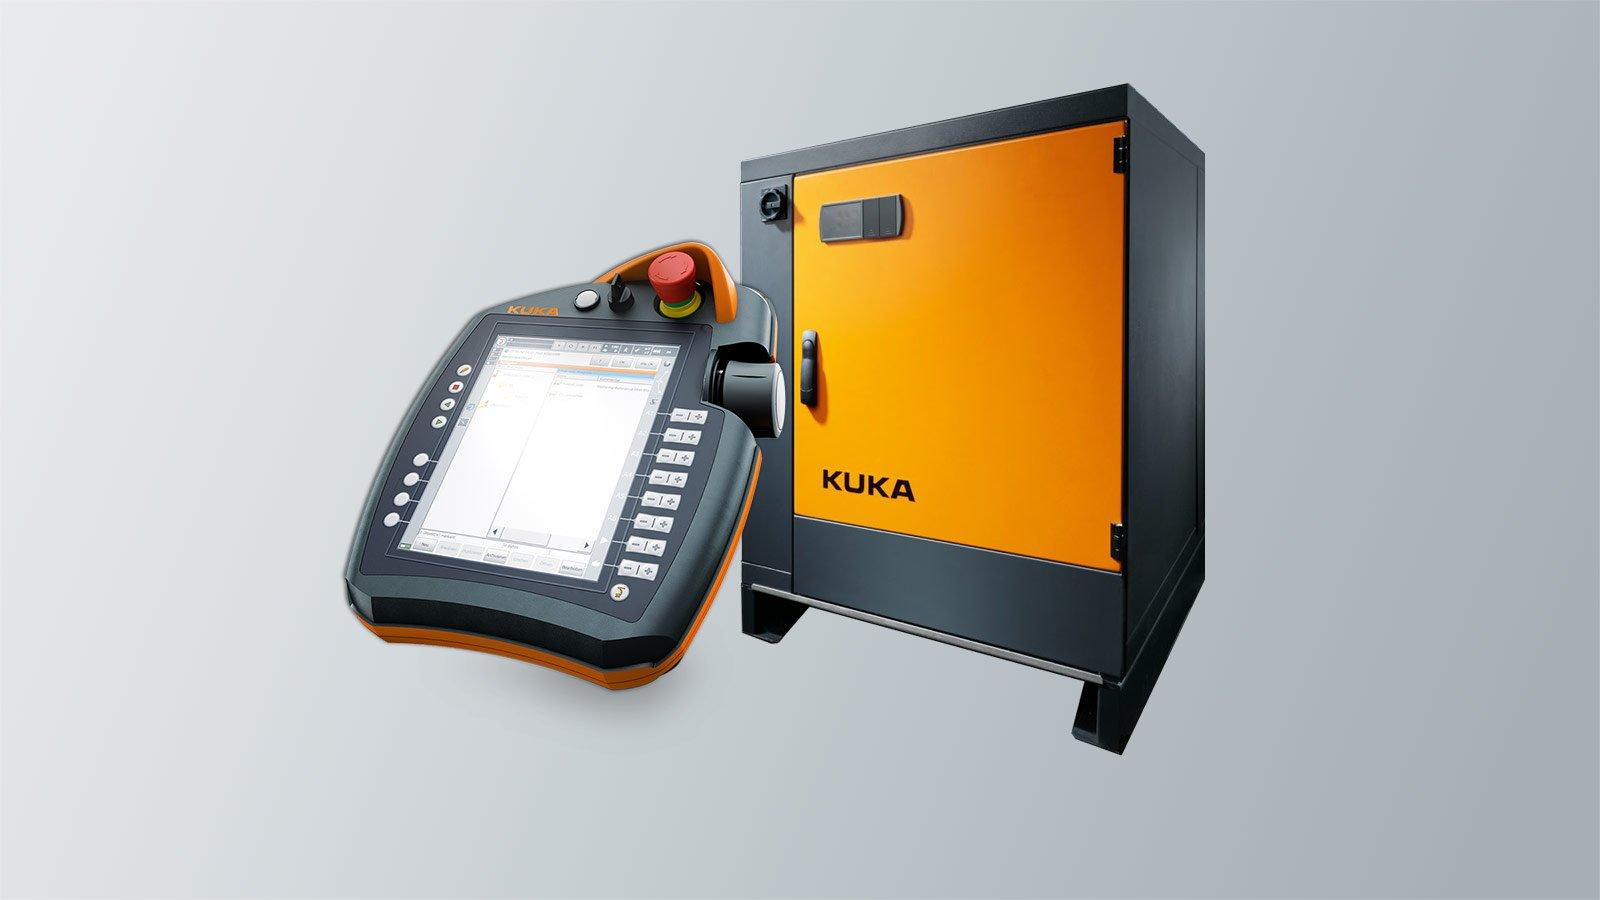 The KUKA smartPAD: simply more freedom